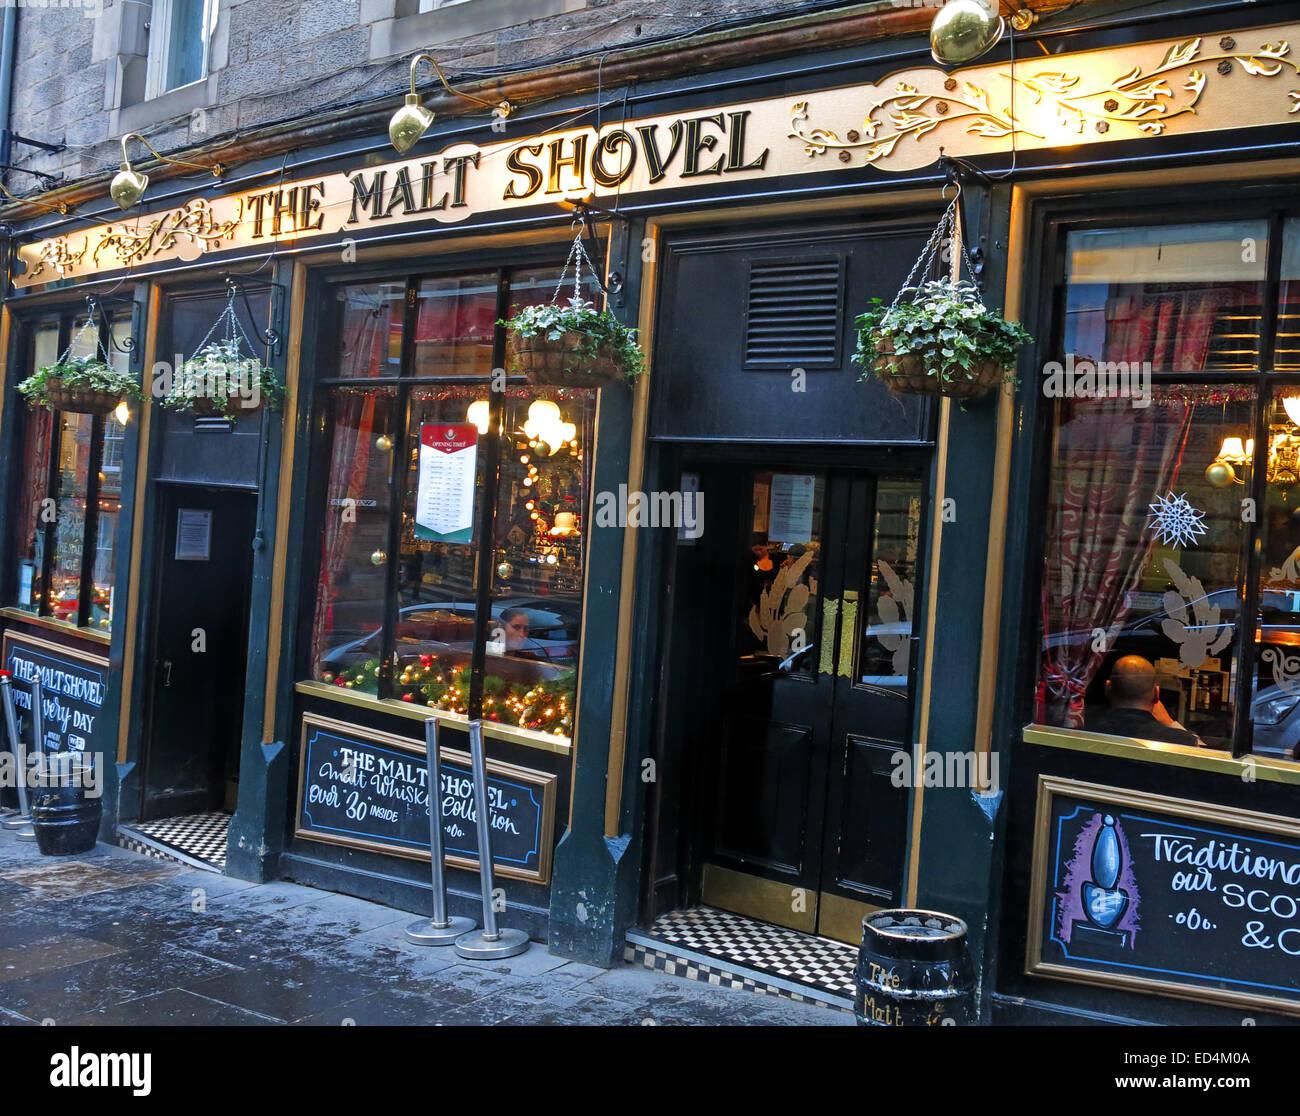 Evening,dusk,Malt,Shovel,malt,whiskies,bar,ale,house,alehouse,beer,beers,drinks,drinkers,historic,history,CAMRA,old Town,old,town,Scotland,UK,classic,Victorian,Scotland,UK in the,evening,dusk,nighttime,at night,entrance,doorway,door,front door,Gotonysmith